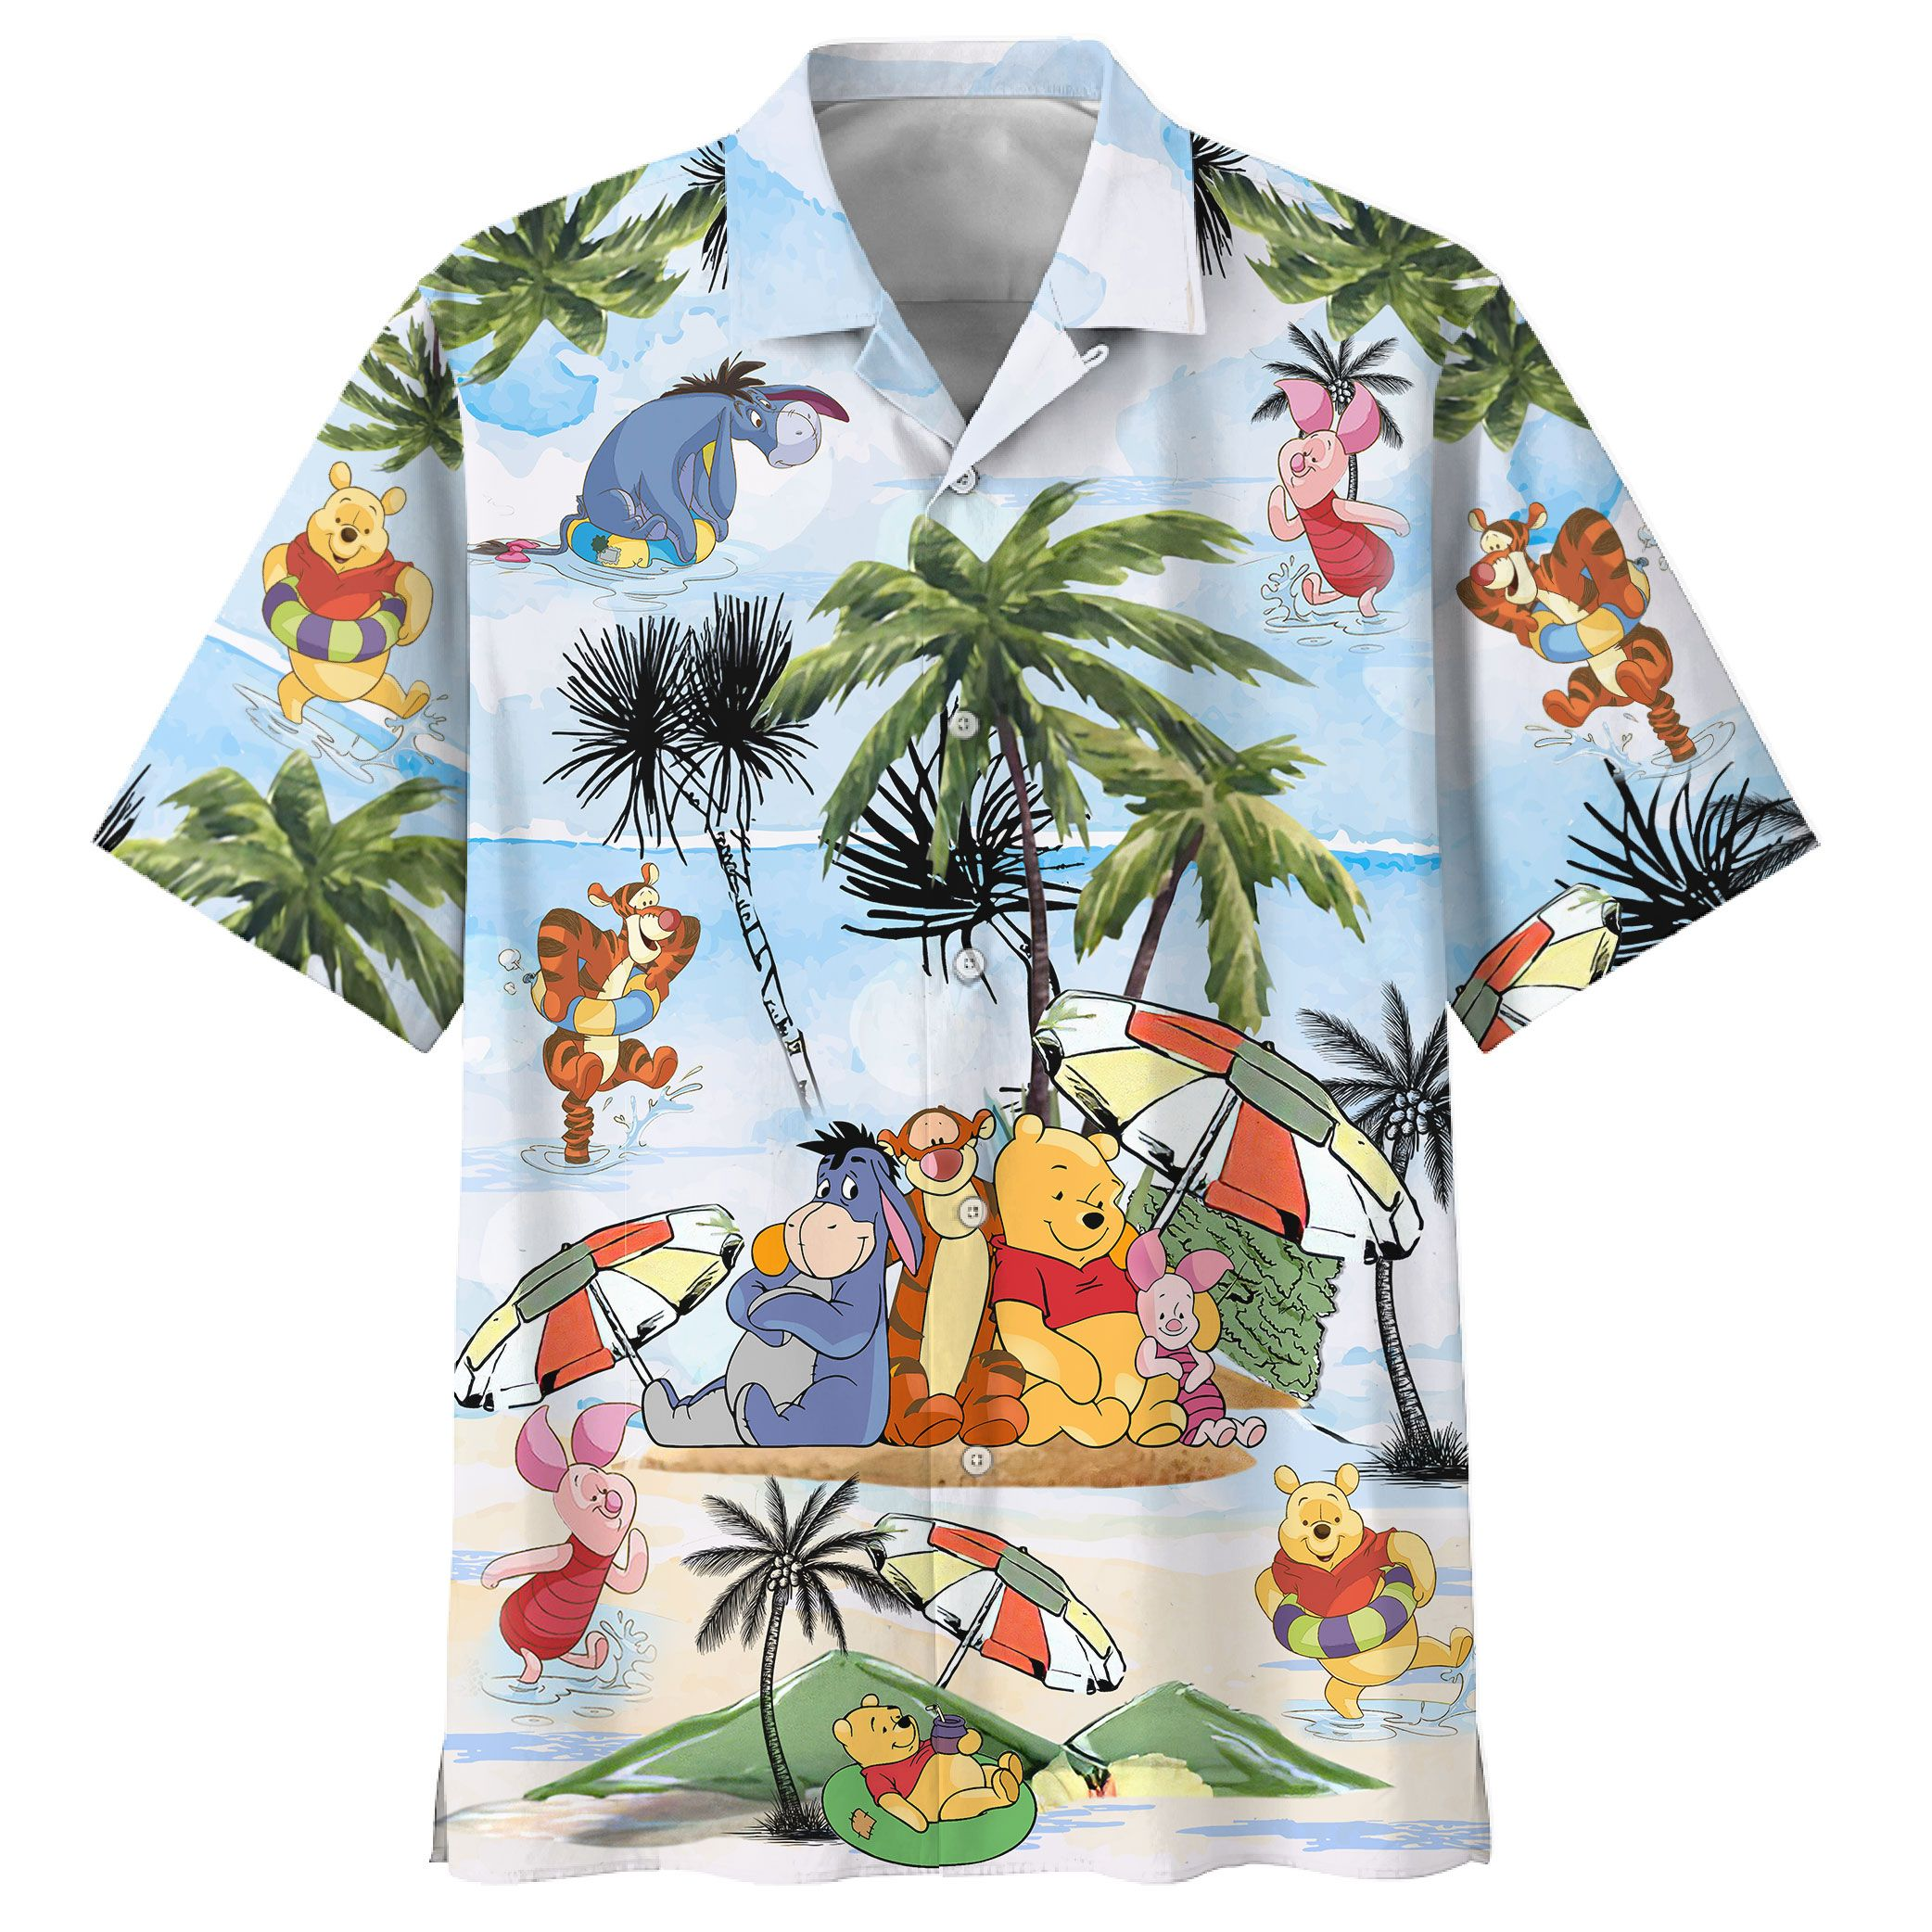 Winnie The Pooh Summer Time Hawaiian Shirt